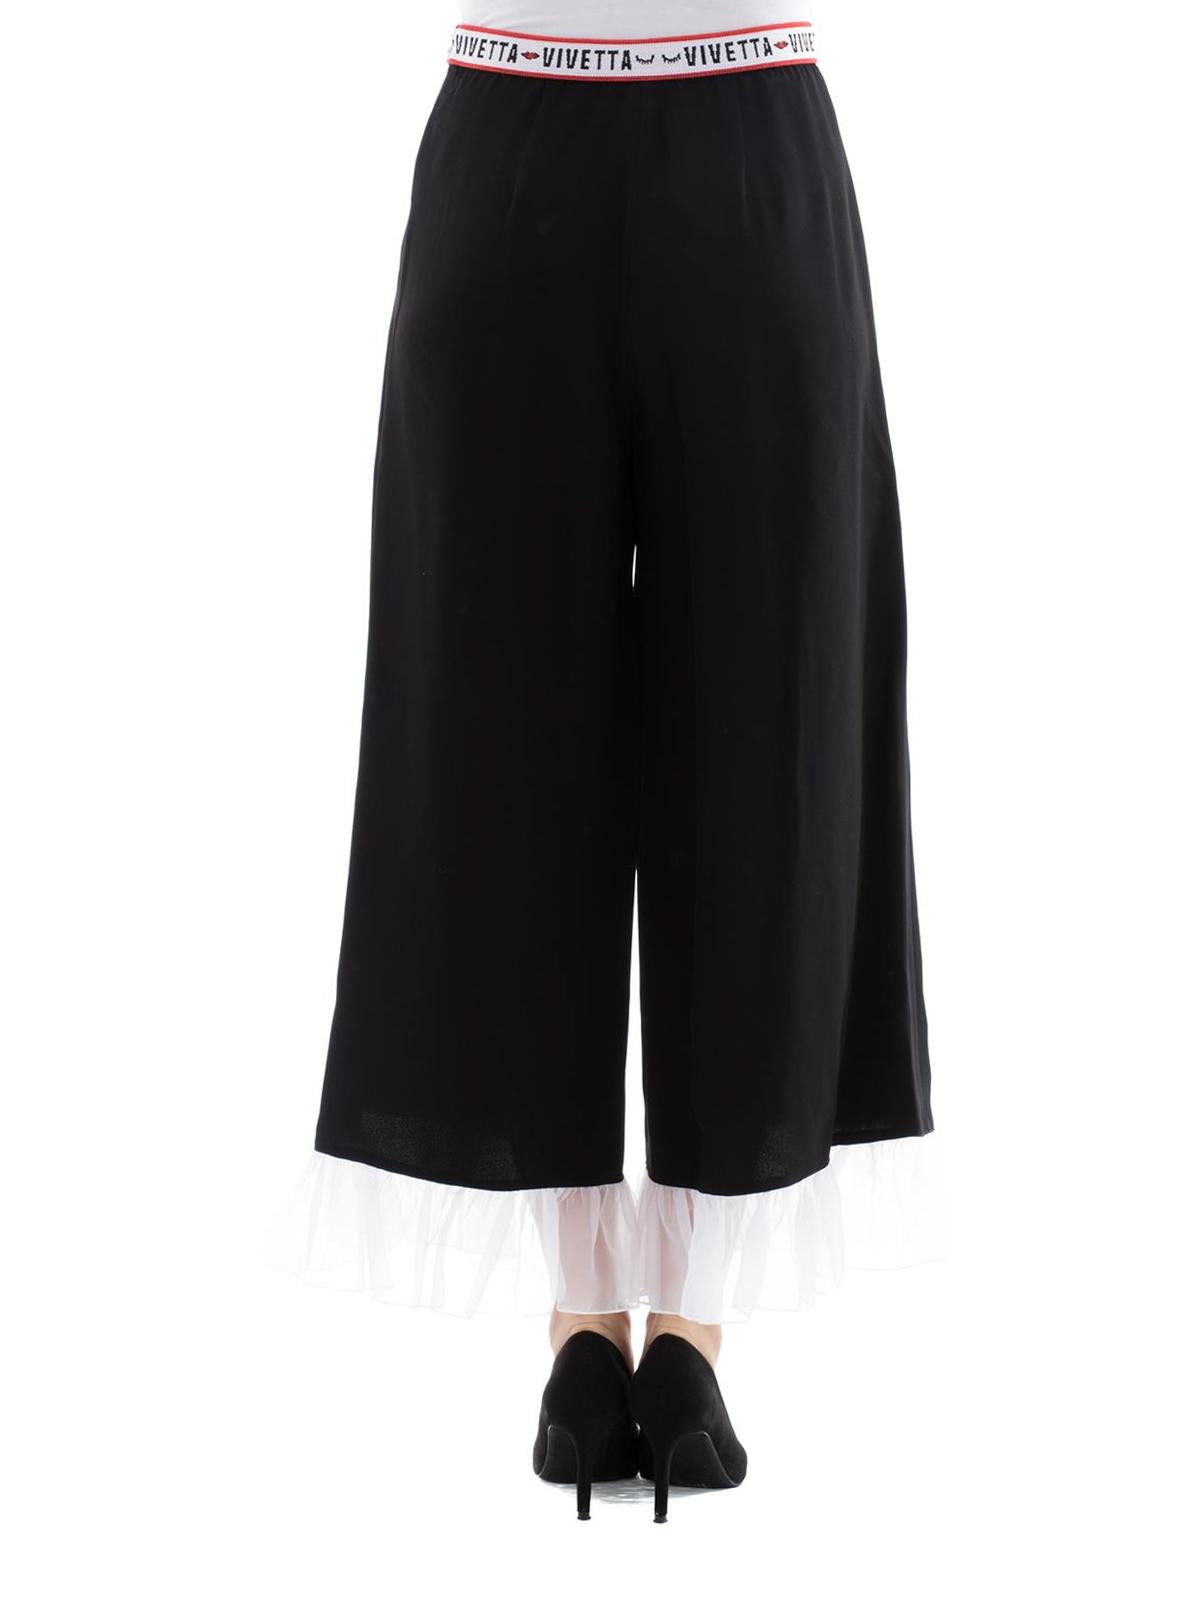 Euridome trousers - Black Vivetta kFxYrt